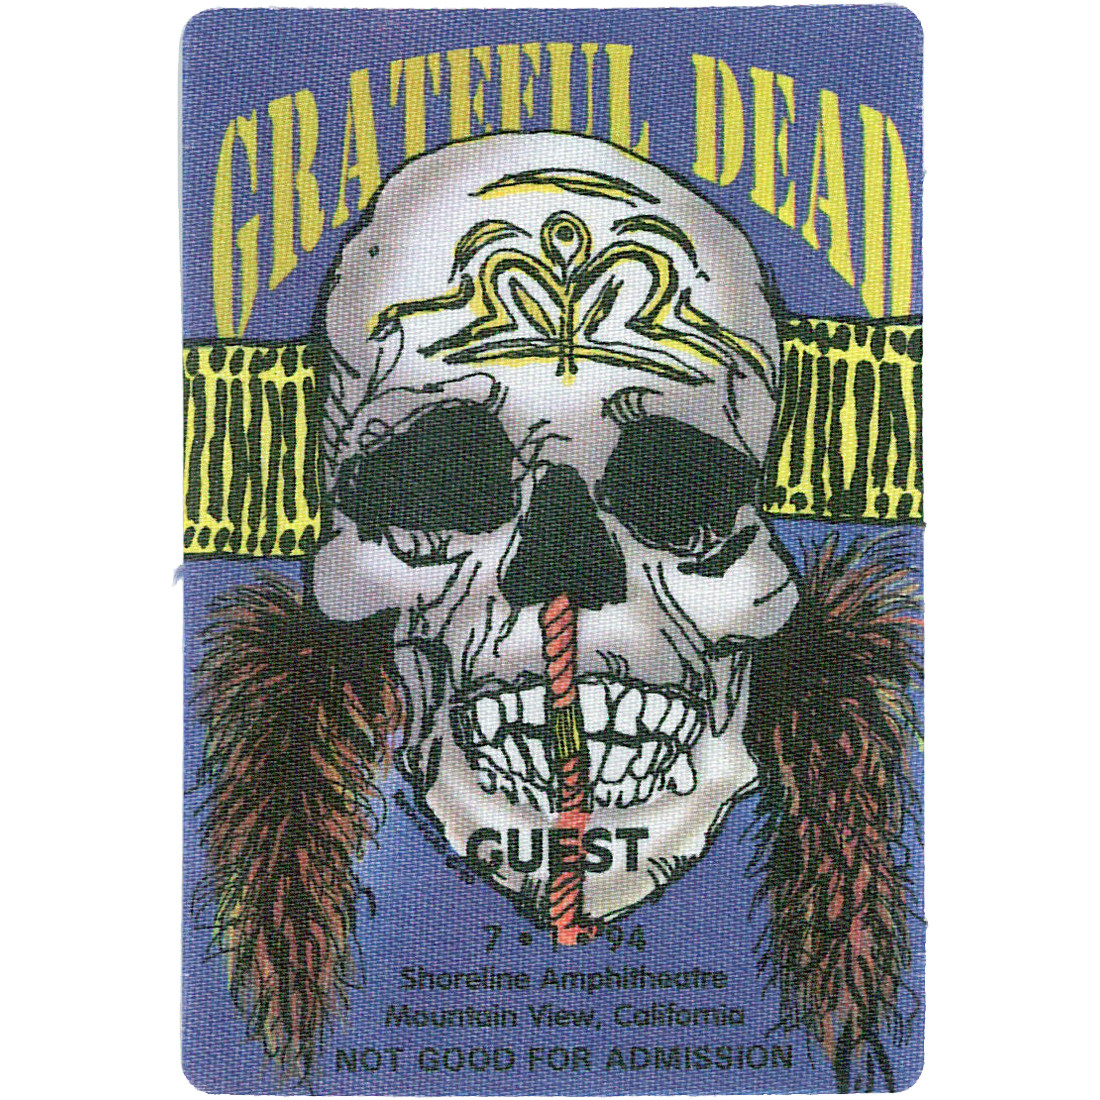 Grateful Dead 1994 07-01 Backstage Pass